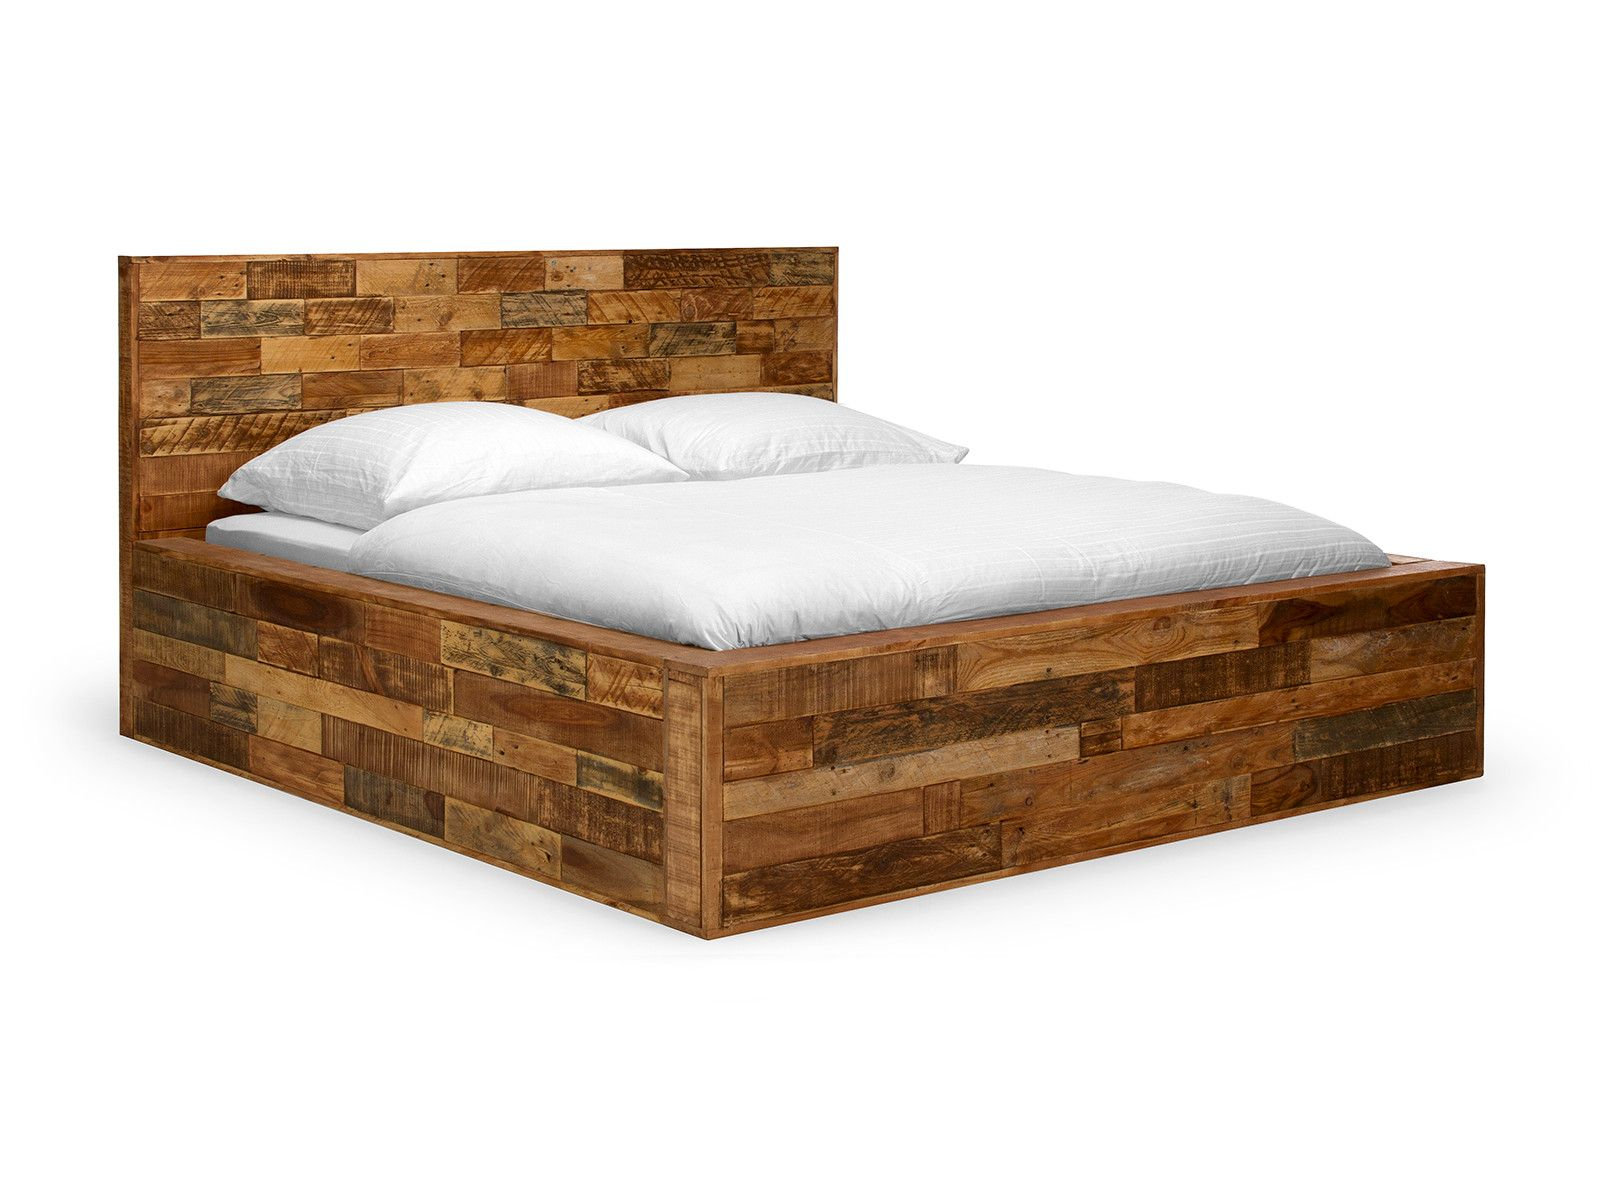 Bett Mayari 180x200 | Betten, Holzarbeiten und Möbel